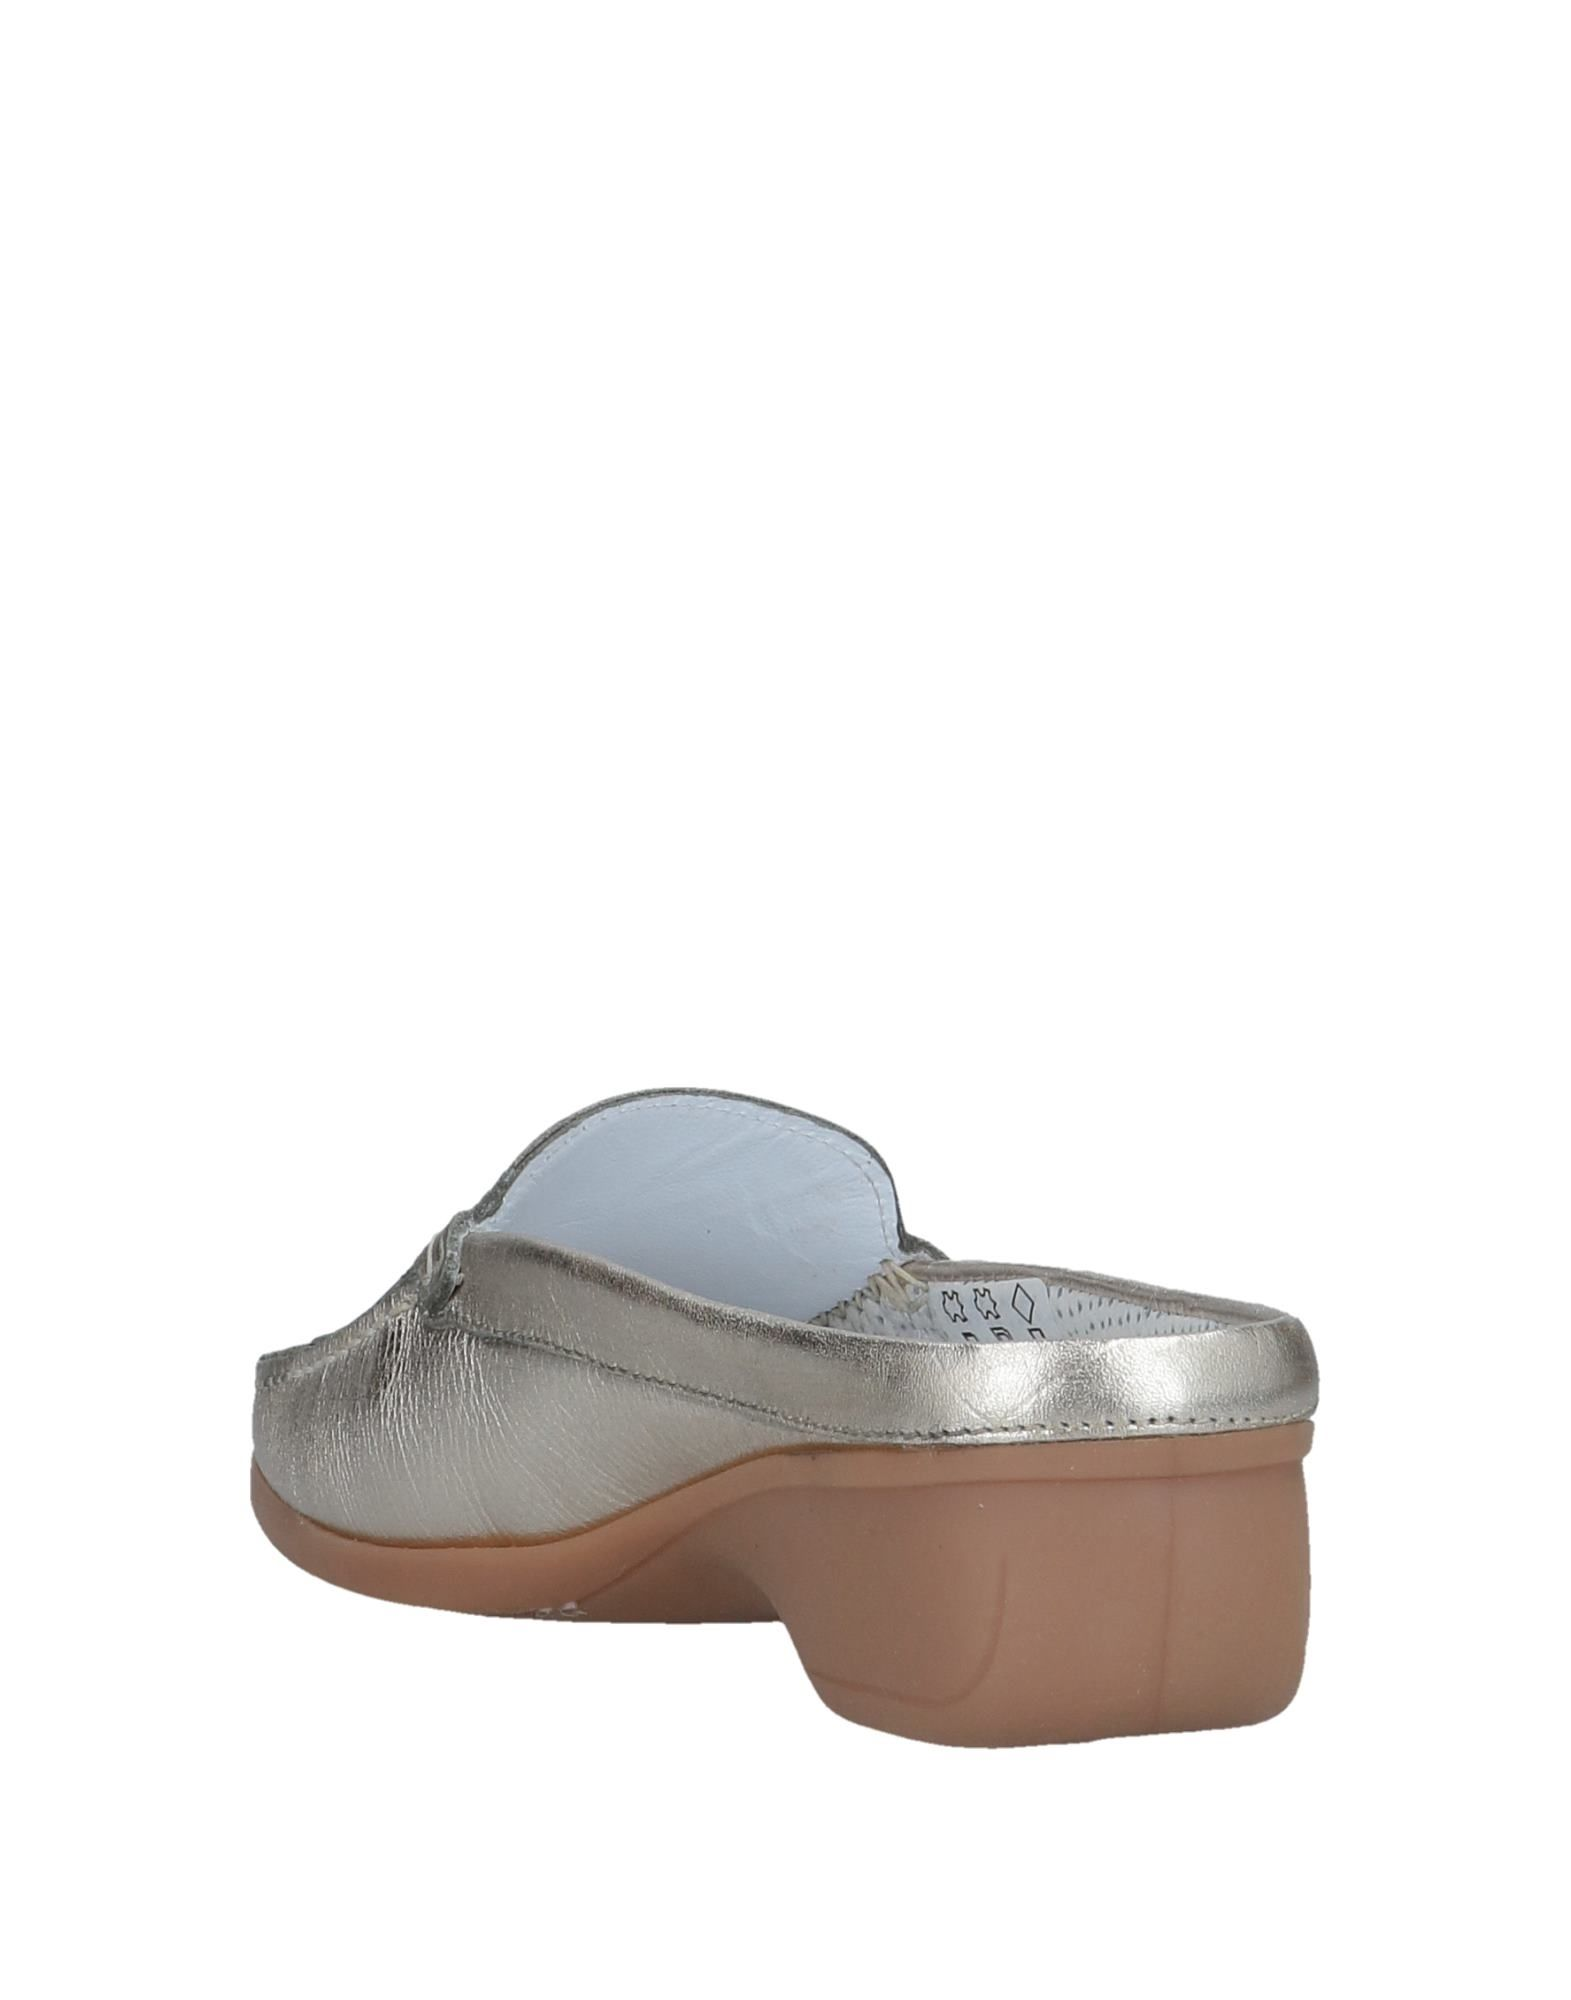 Valleverde Pantoletten Damen Qualität  11554304BL Gute Qualität Damen beliebte Schuhe 62e31f